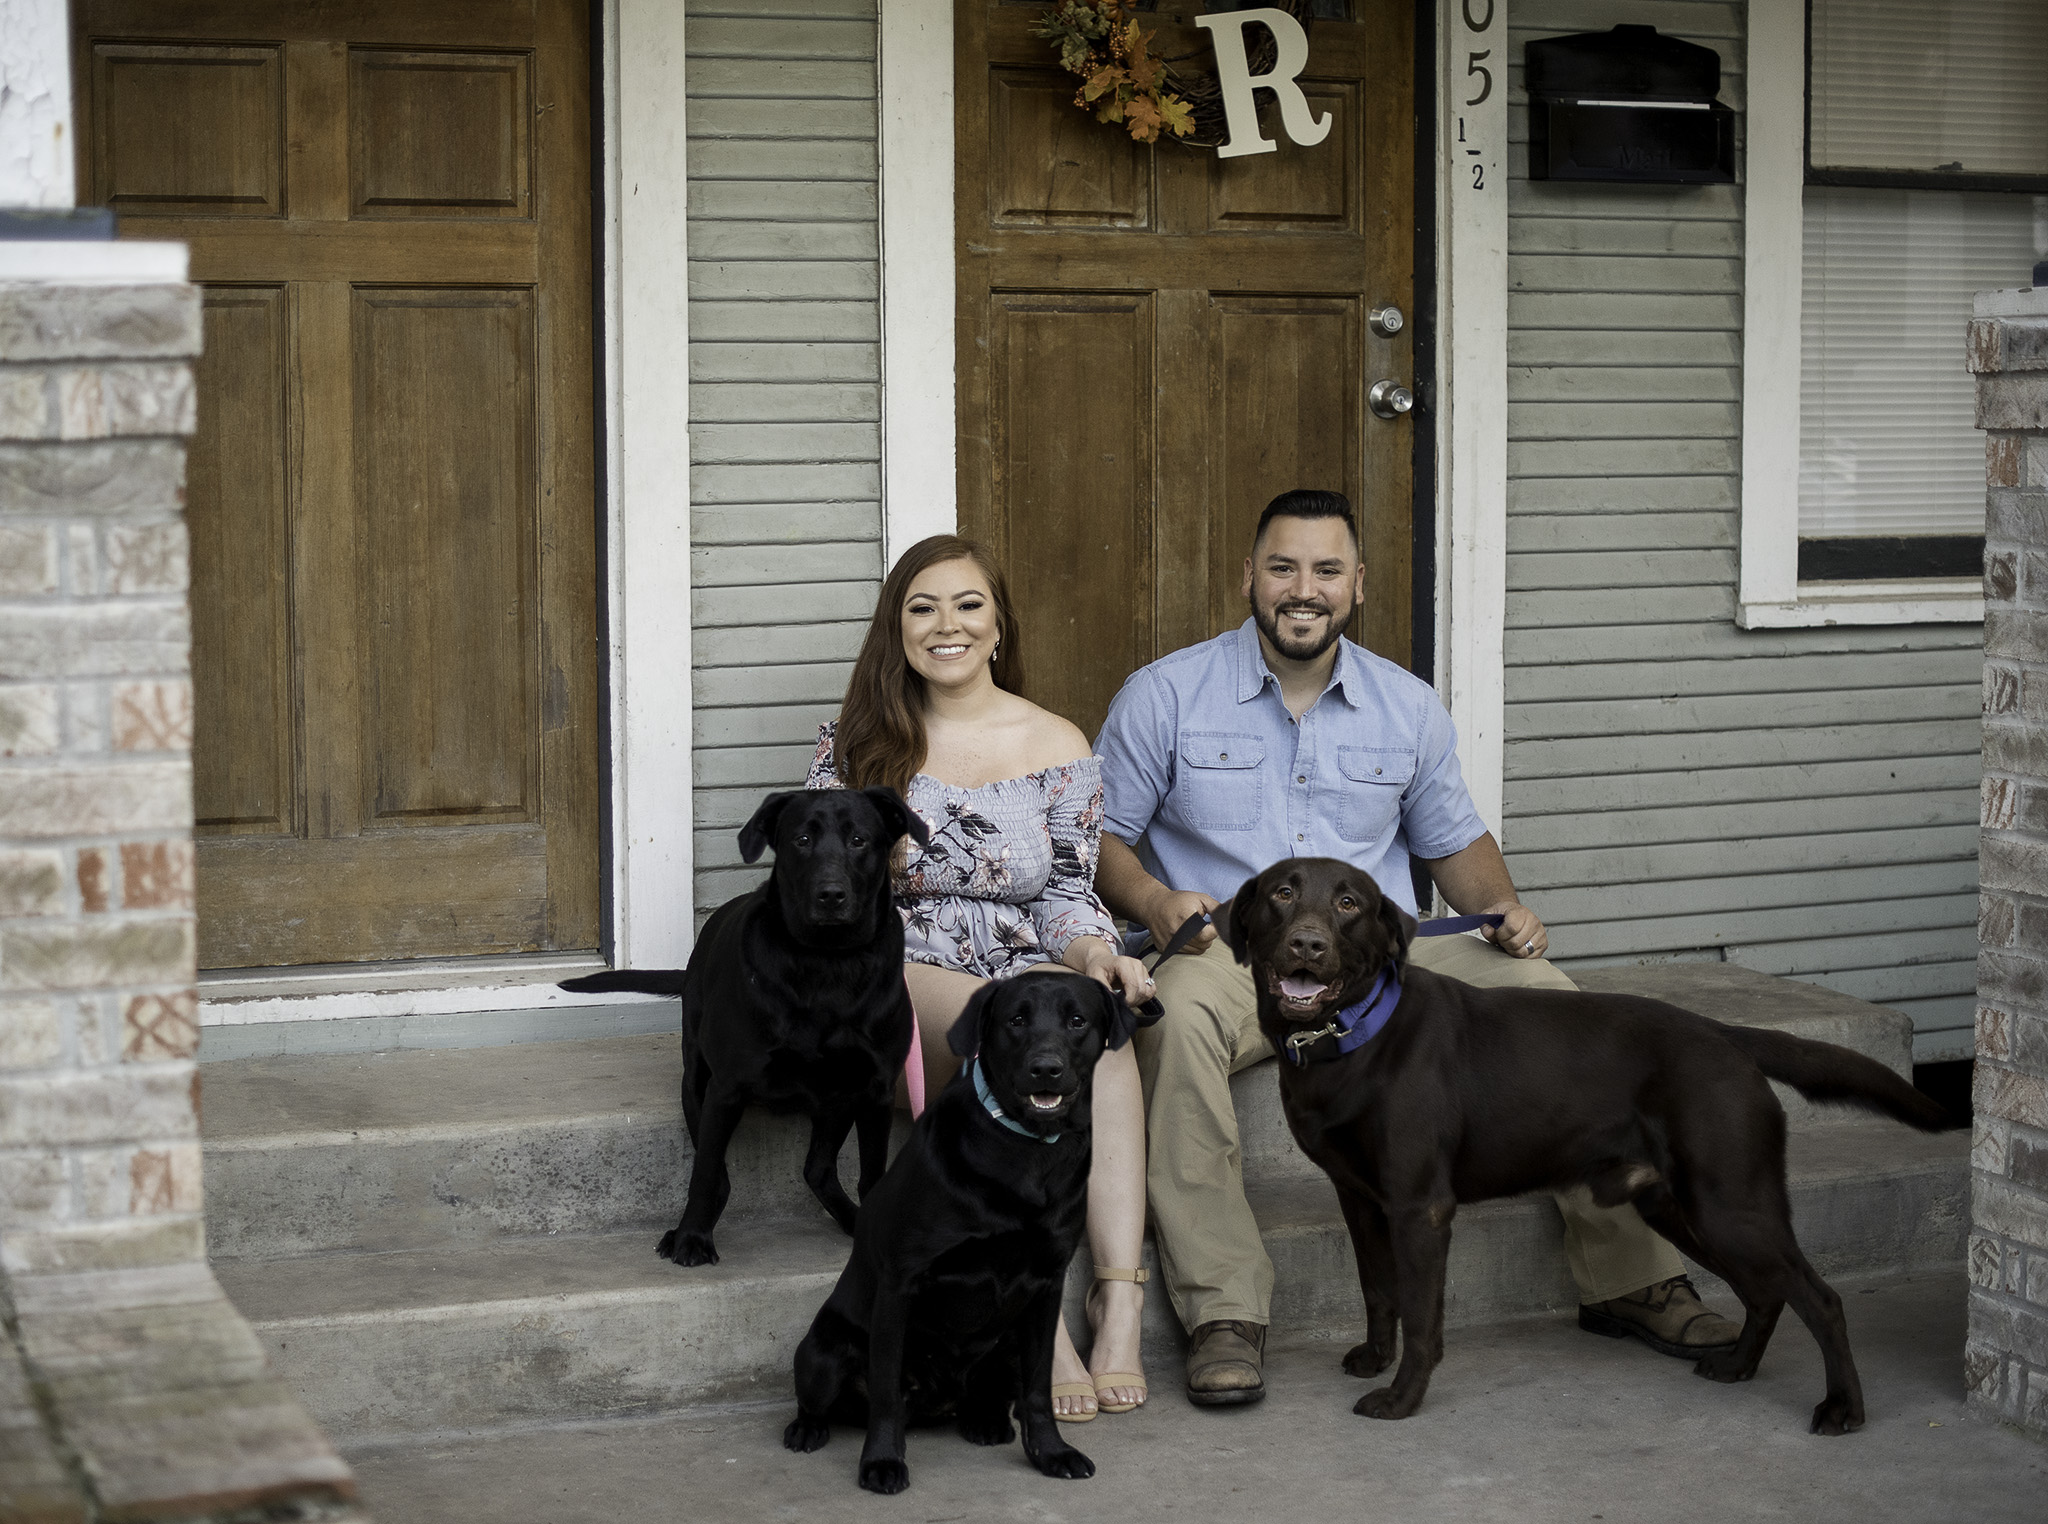 houston-engagement-coupe-photo-session-pets-black-labs